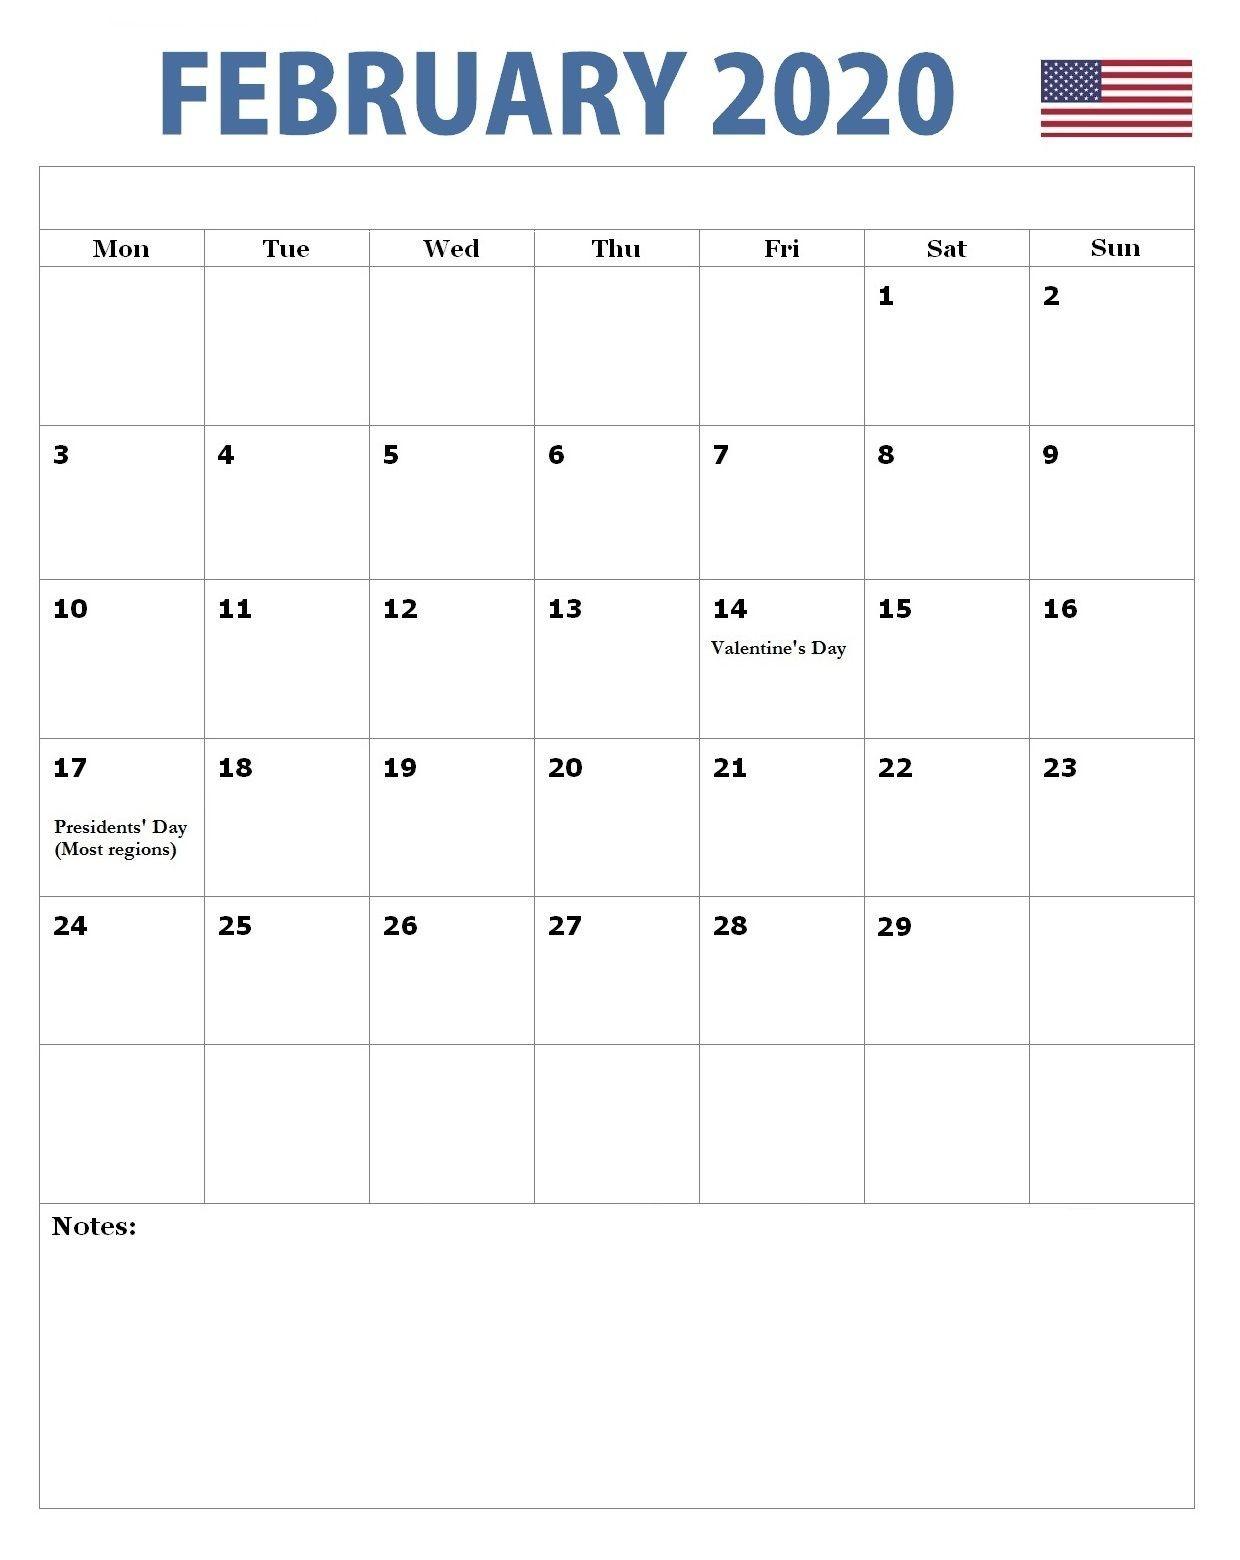 February 2020 American Holidays Calendar